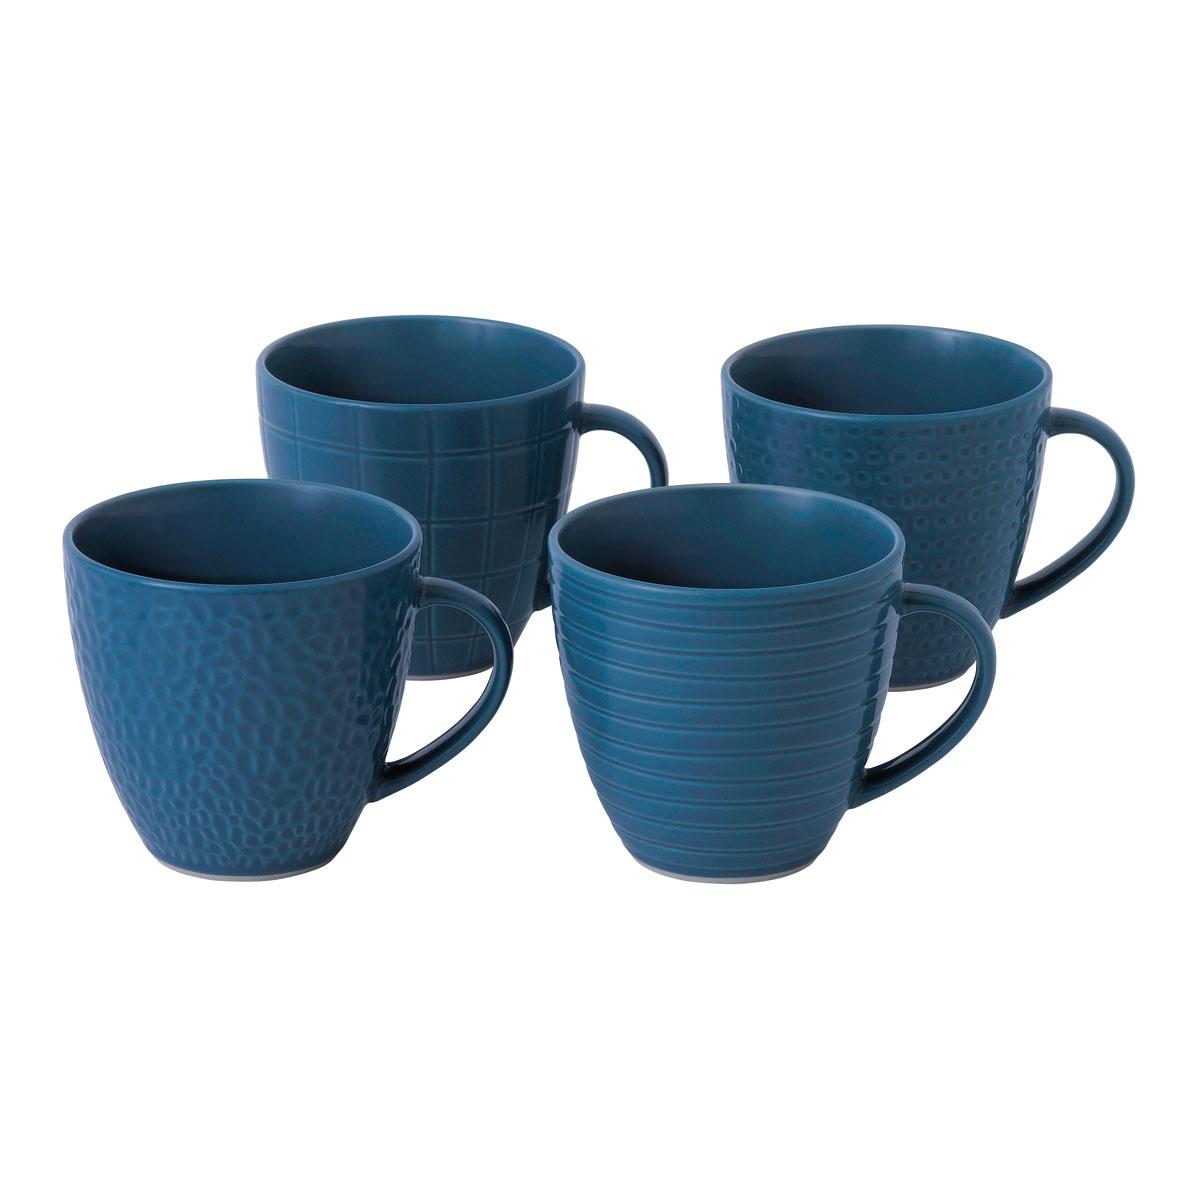 Royal Doulton Gordon Ramsay Maze Grill Mug Blue 12.6 Oz Set of 4 Mixed